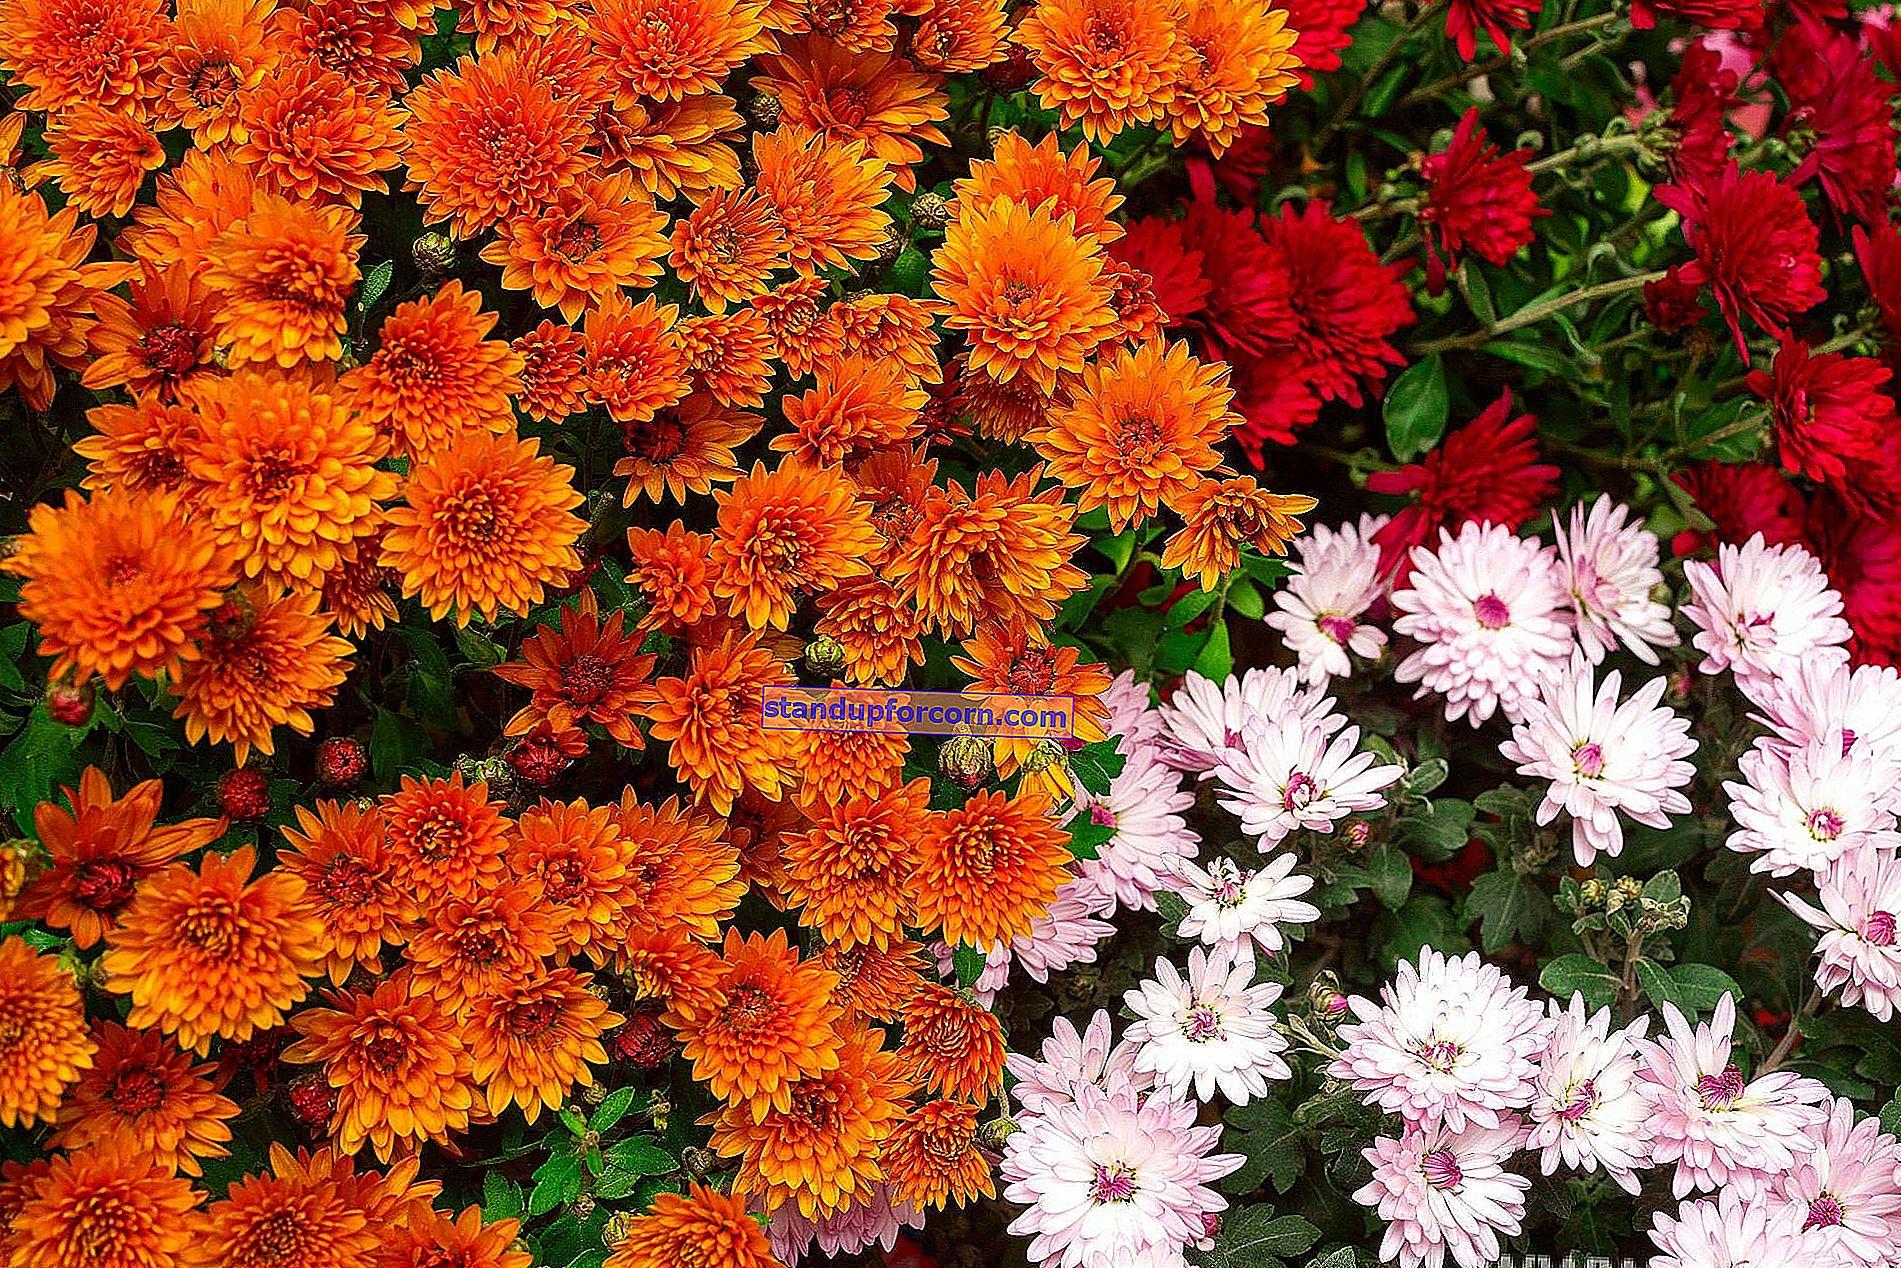 Krysantemum - dyrking, hagesorter, reproduksjon